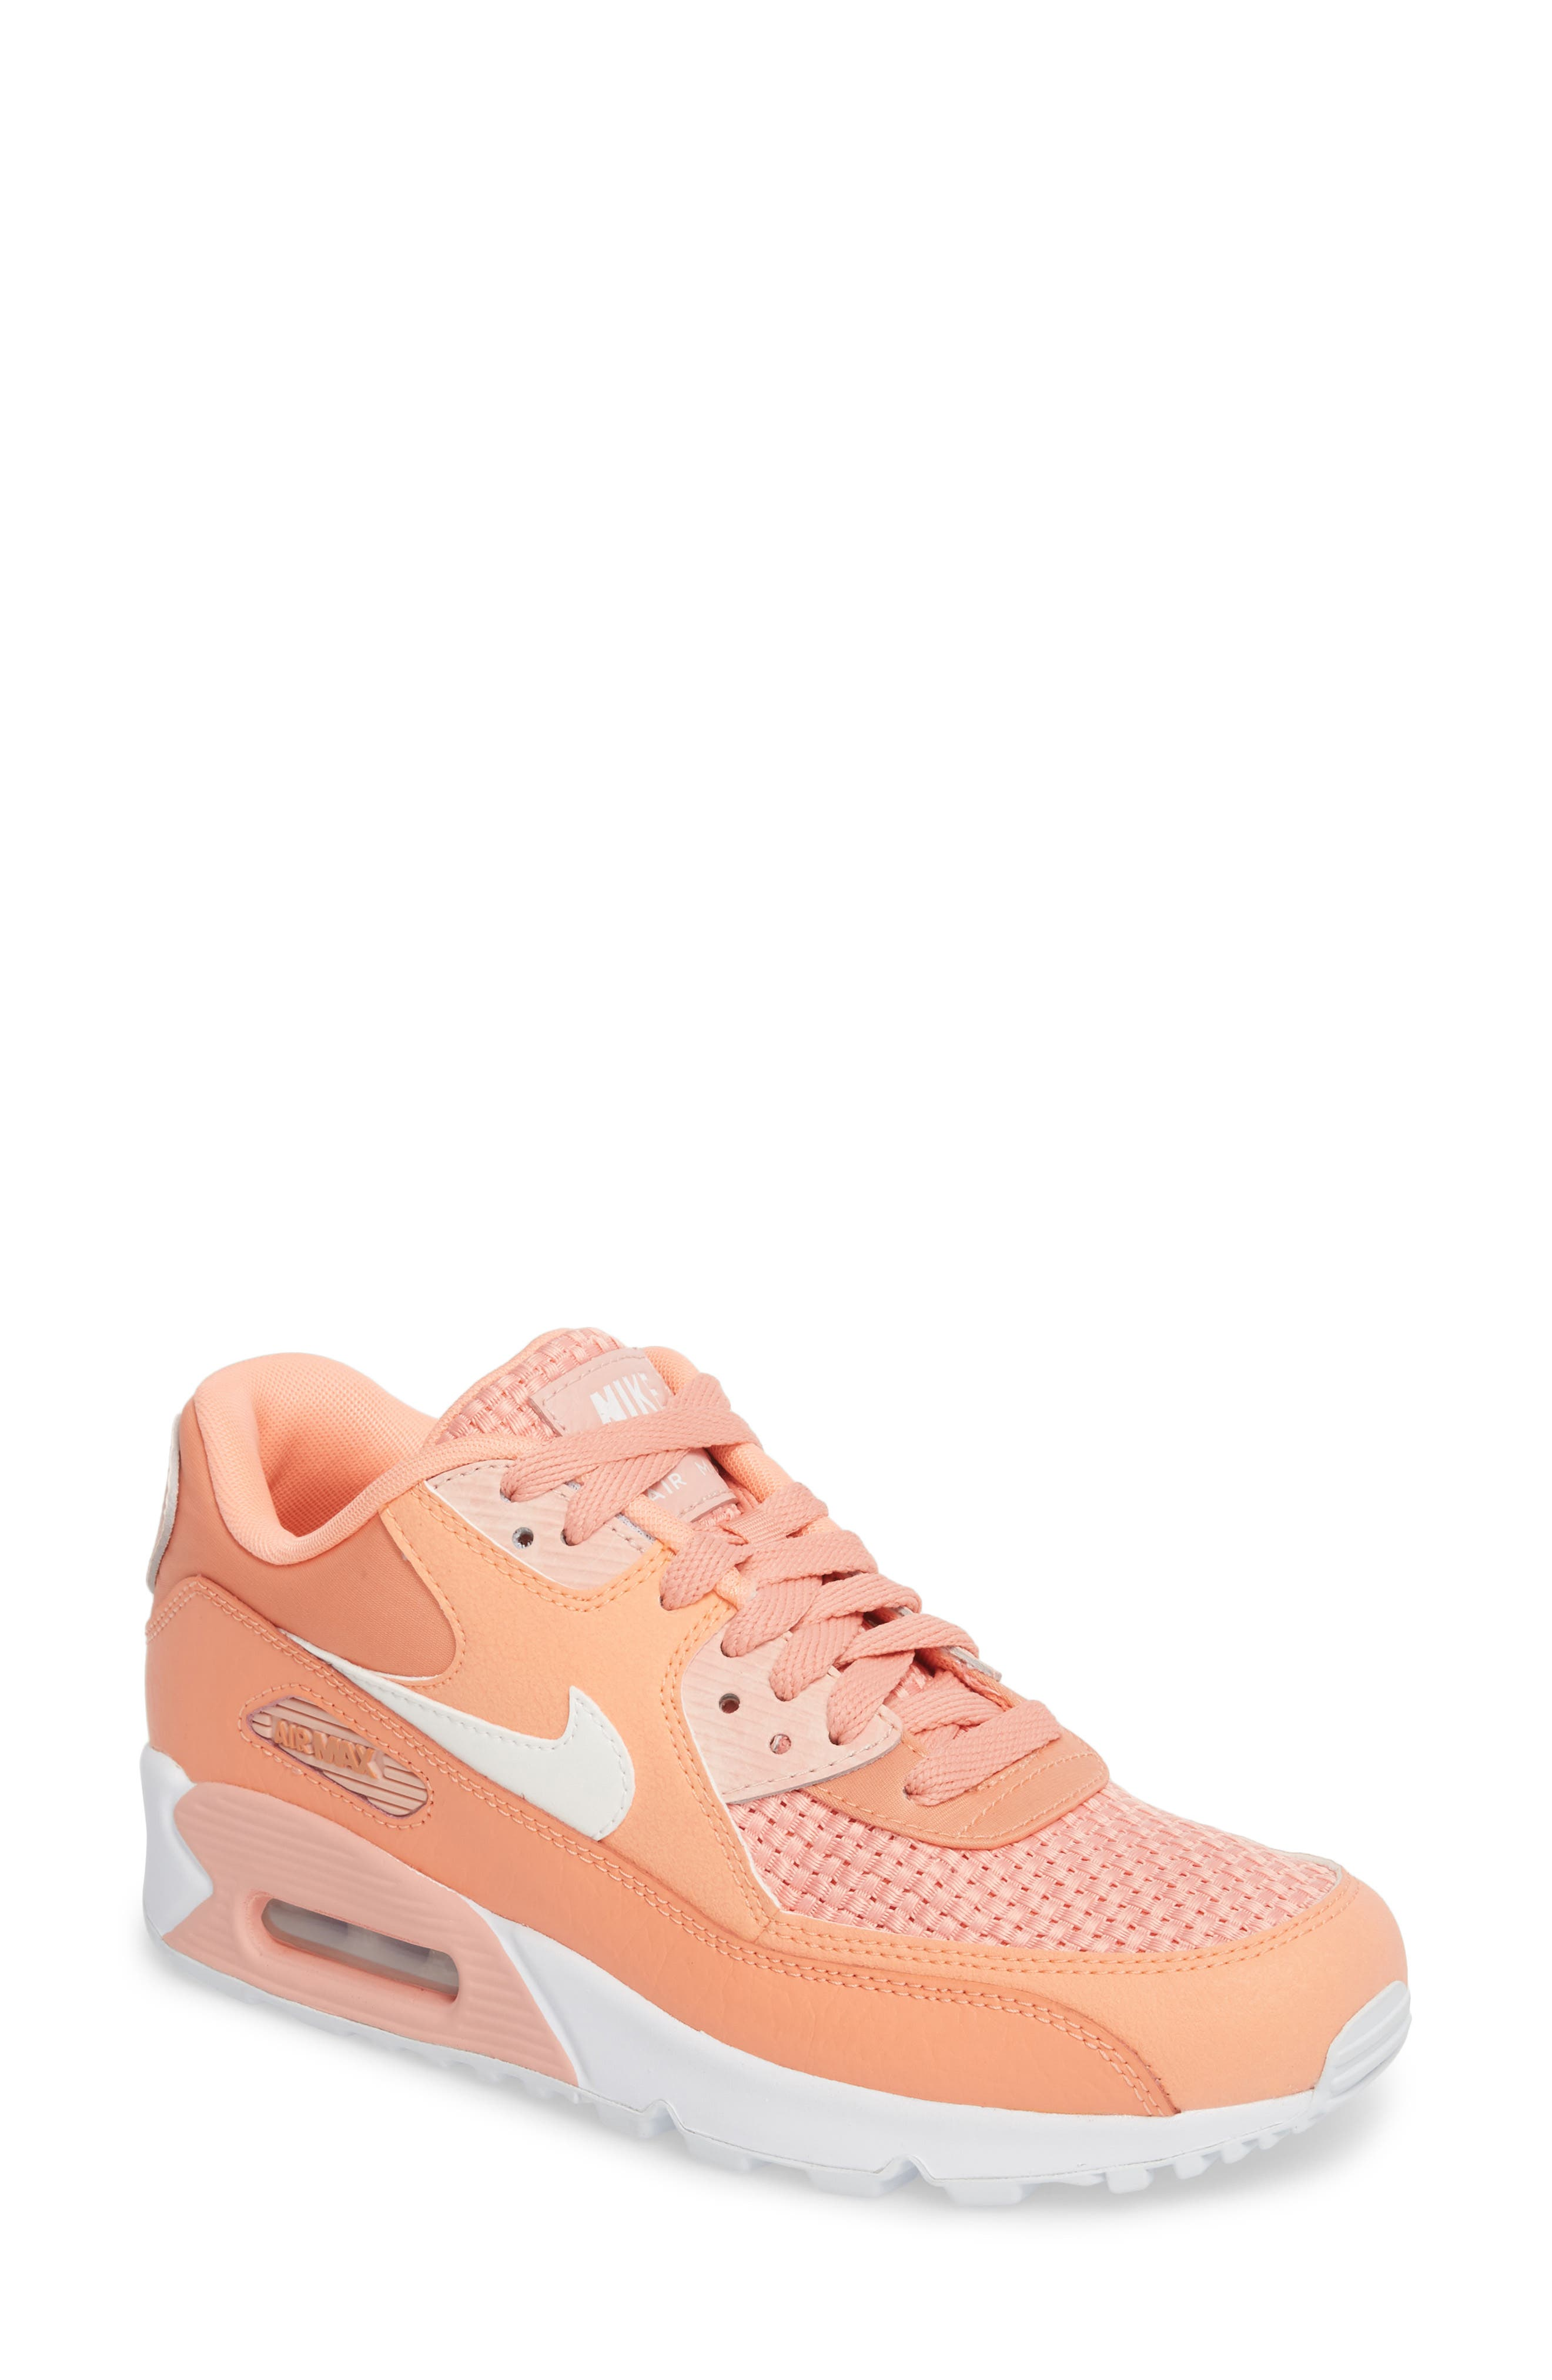 Air Max 90 SE Sneaker,                             Main thumbnail 3, color,